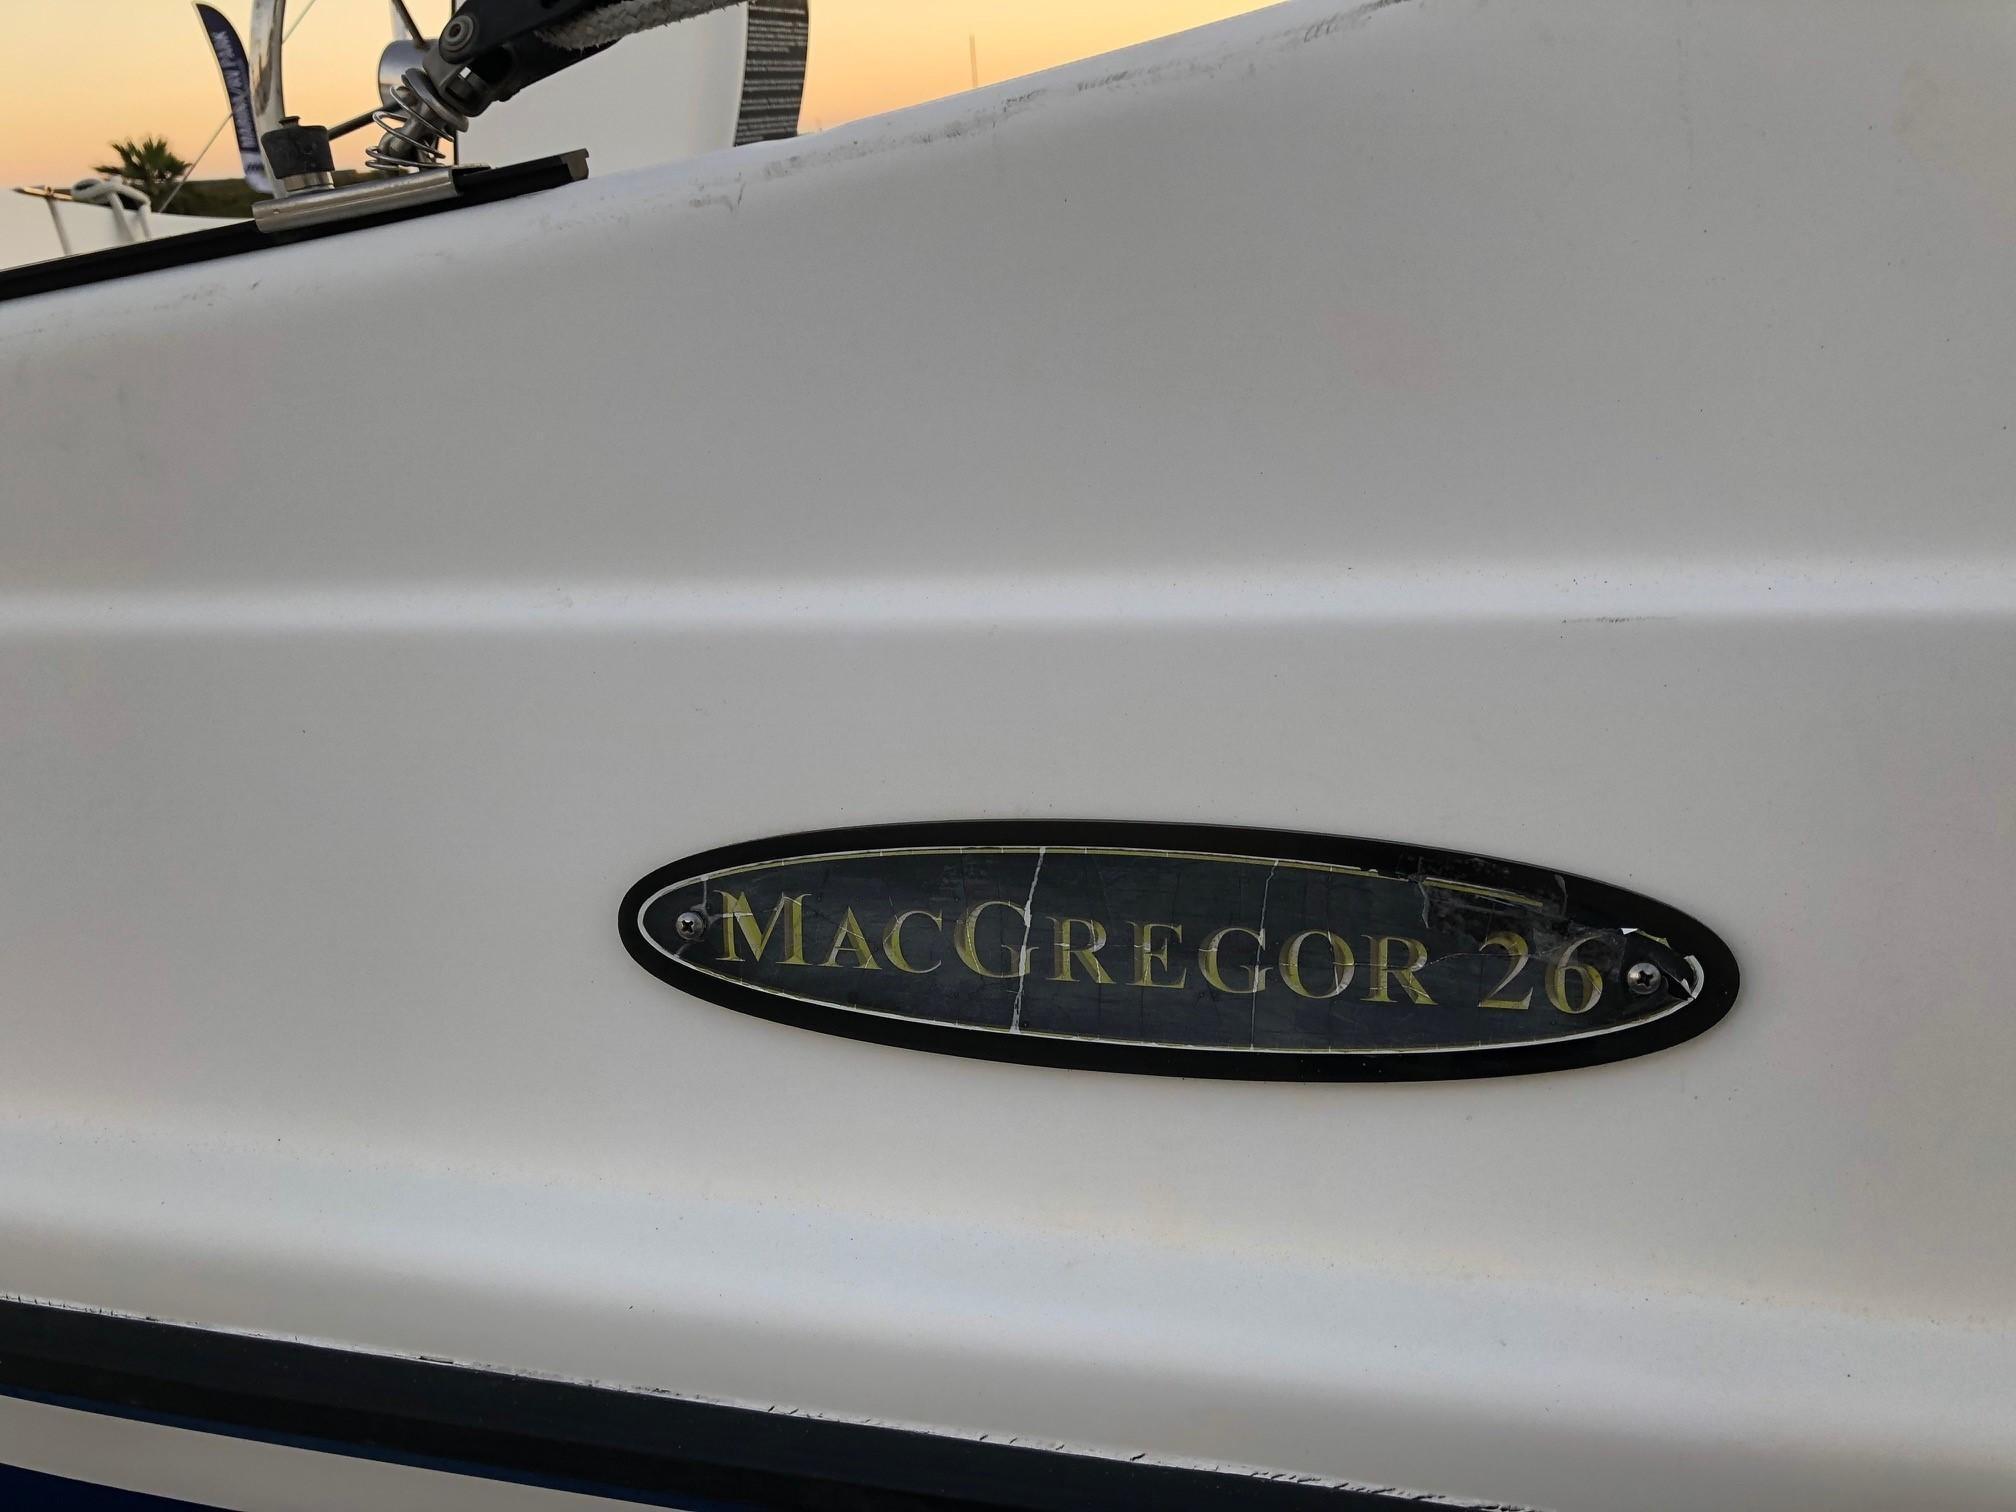 26' MacGregor 2012